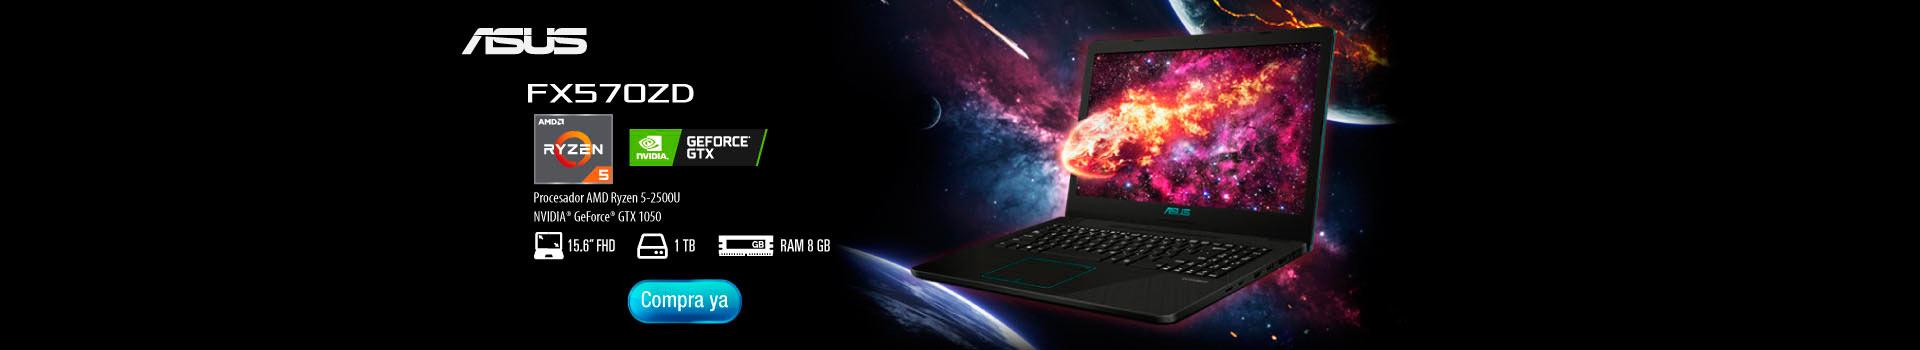 AK-KT-BCAT-2-computadores y tablets-gaming-PP-EXP-AMD/Asus-Portátil Gamer X570ZD-E4091T-dic14